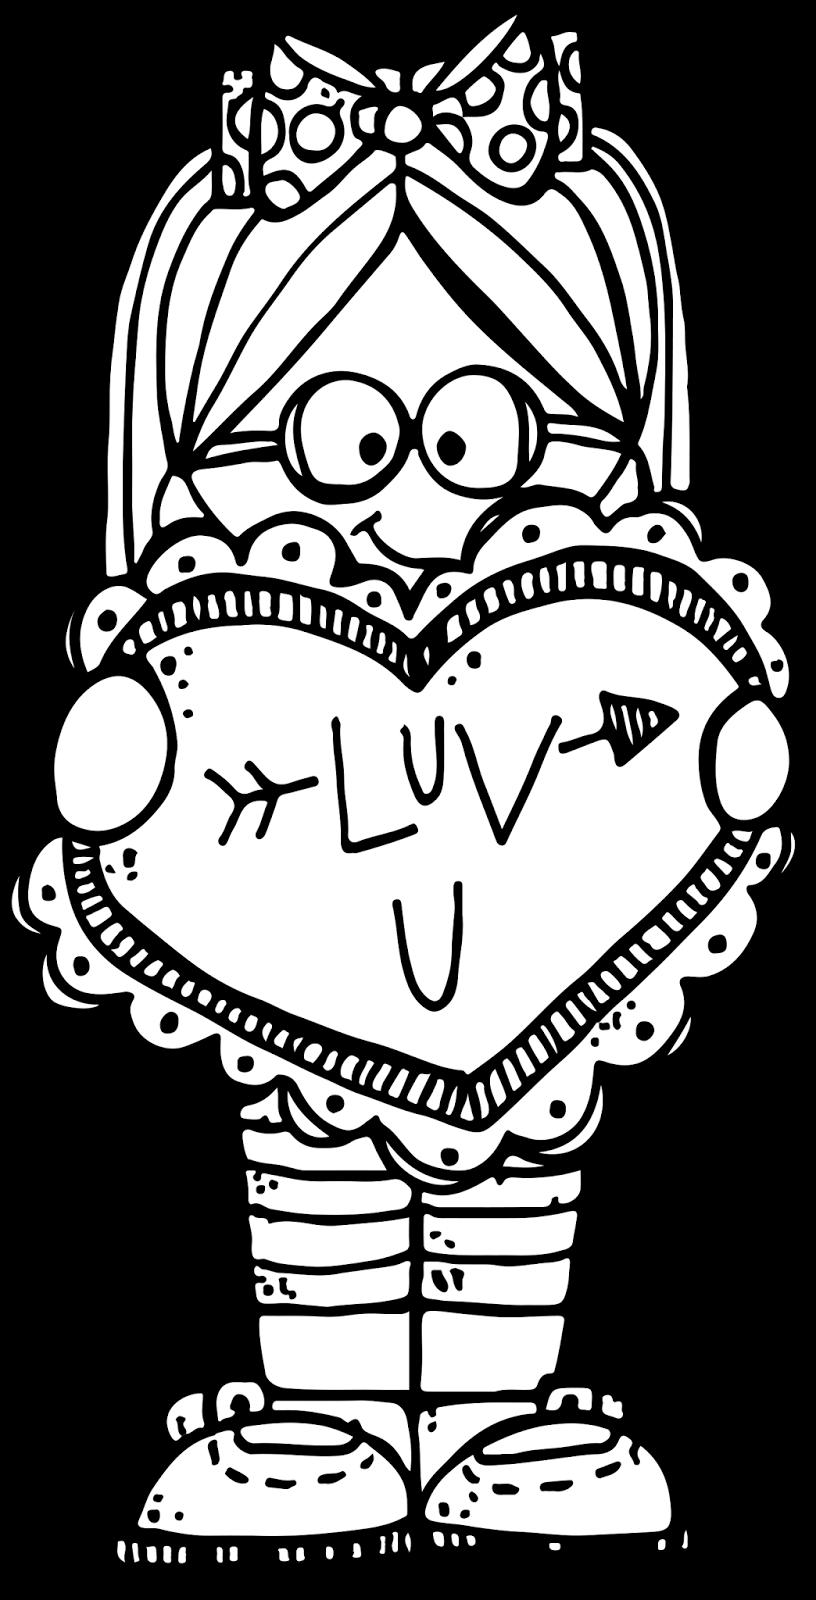 Luvu Mbf 28c 29 Melonheadz Illustrating Llc 2016 Bw Png 816 1 600 Pixels Valentines Day Clipart Melonheadz Clipart Valentine Images